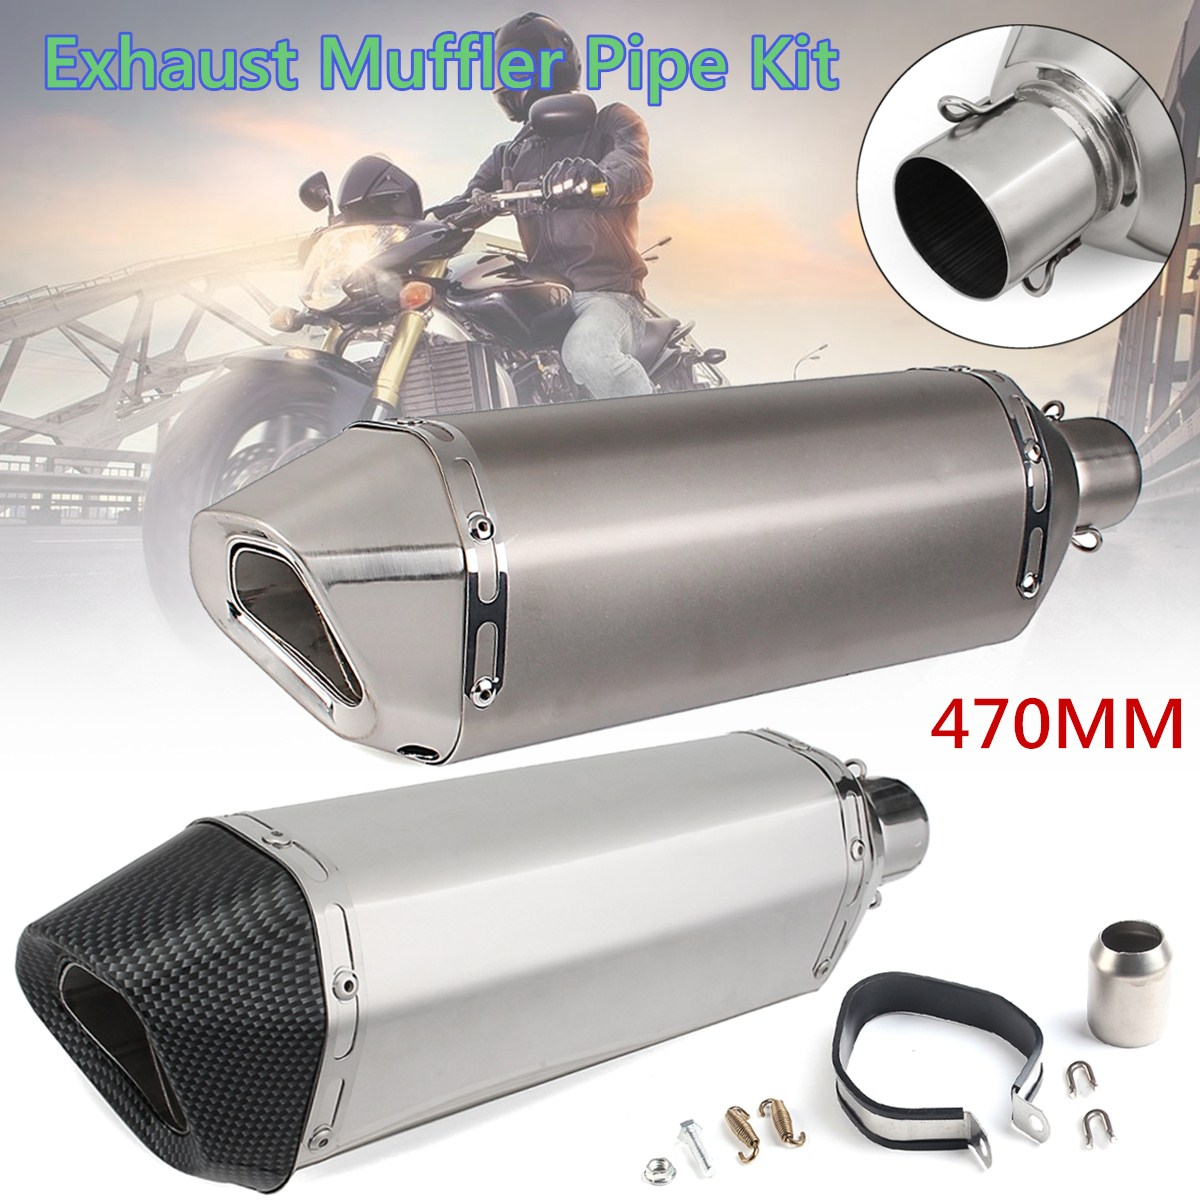 38~51mm Universal Motorcycle Exhaust Stainless Steel Exhaust Muffler Pipe Kit For Honda for KAWASAKI for Yamaha цена